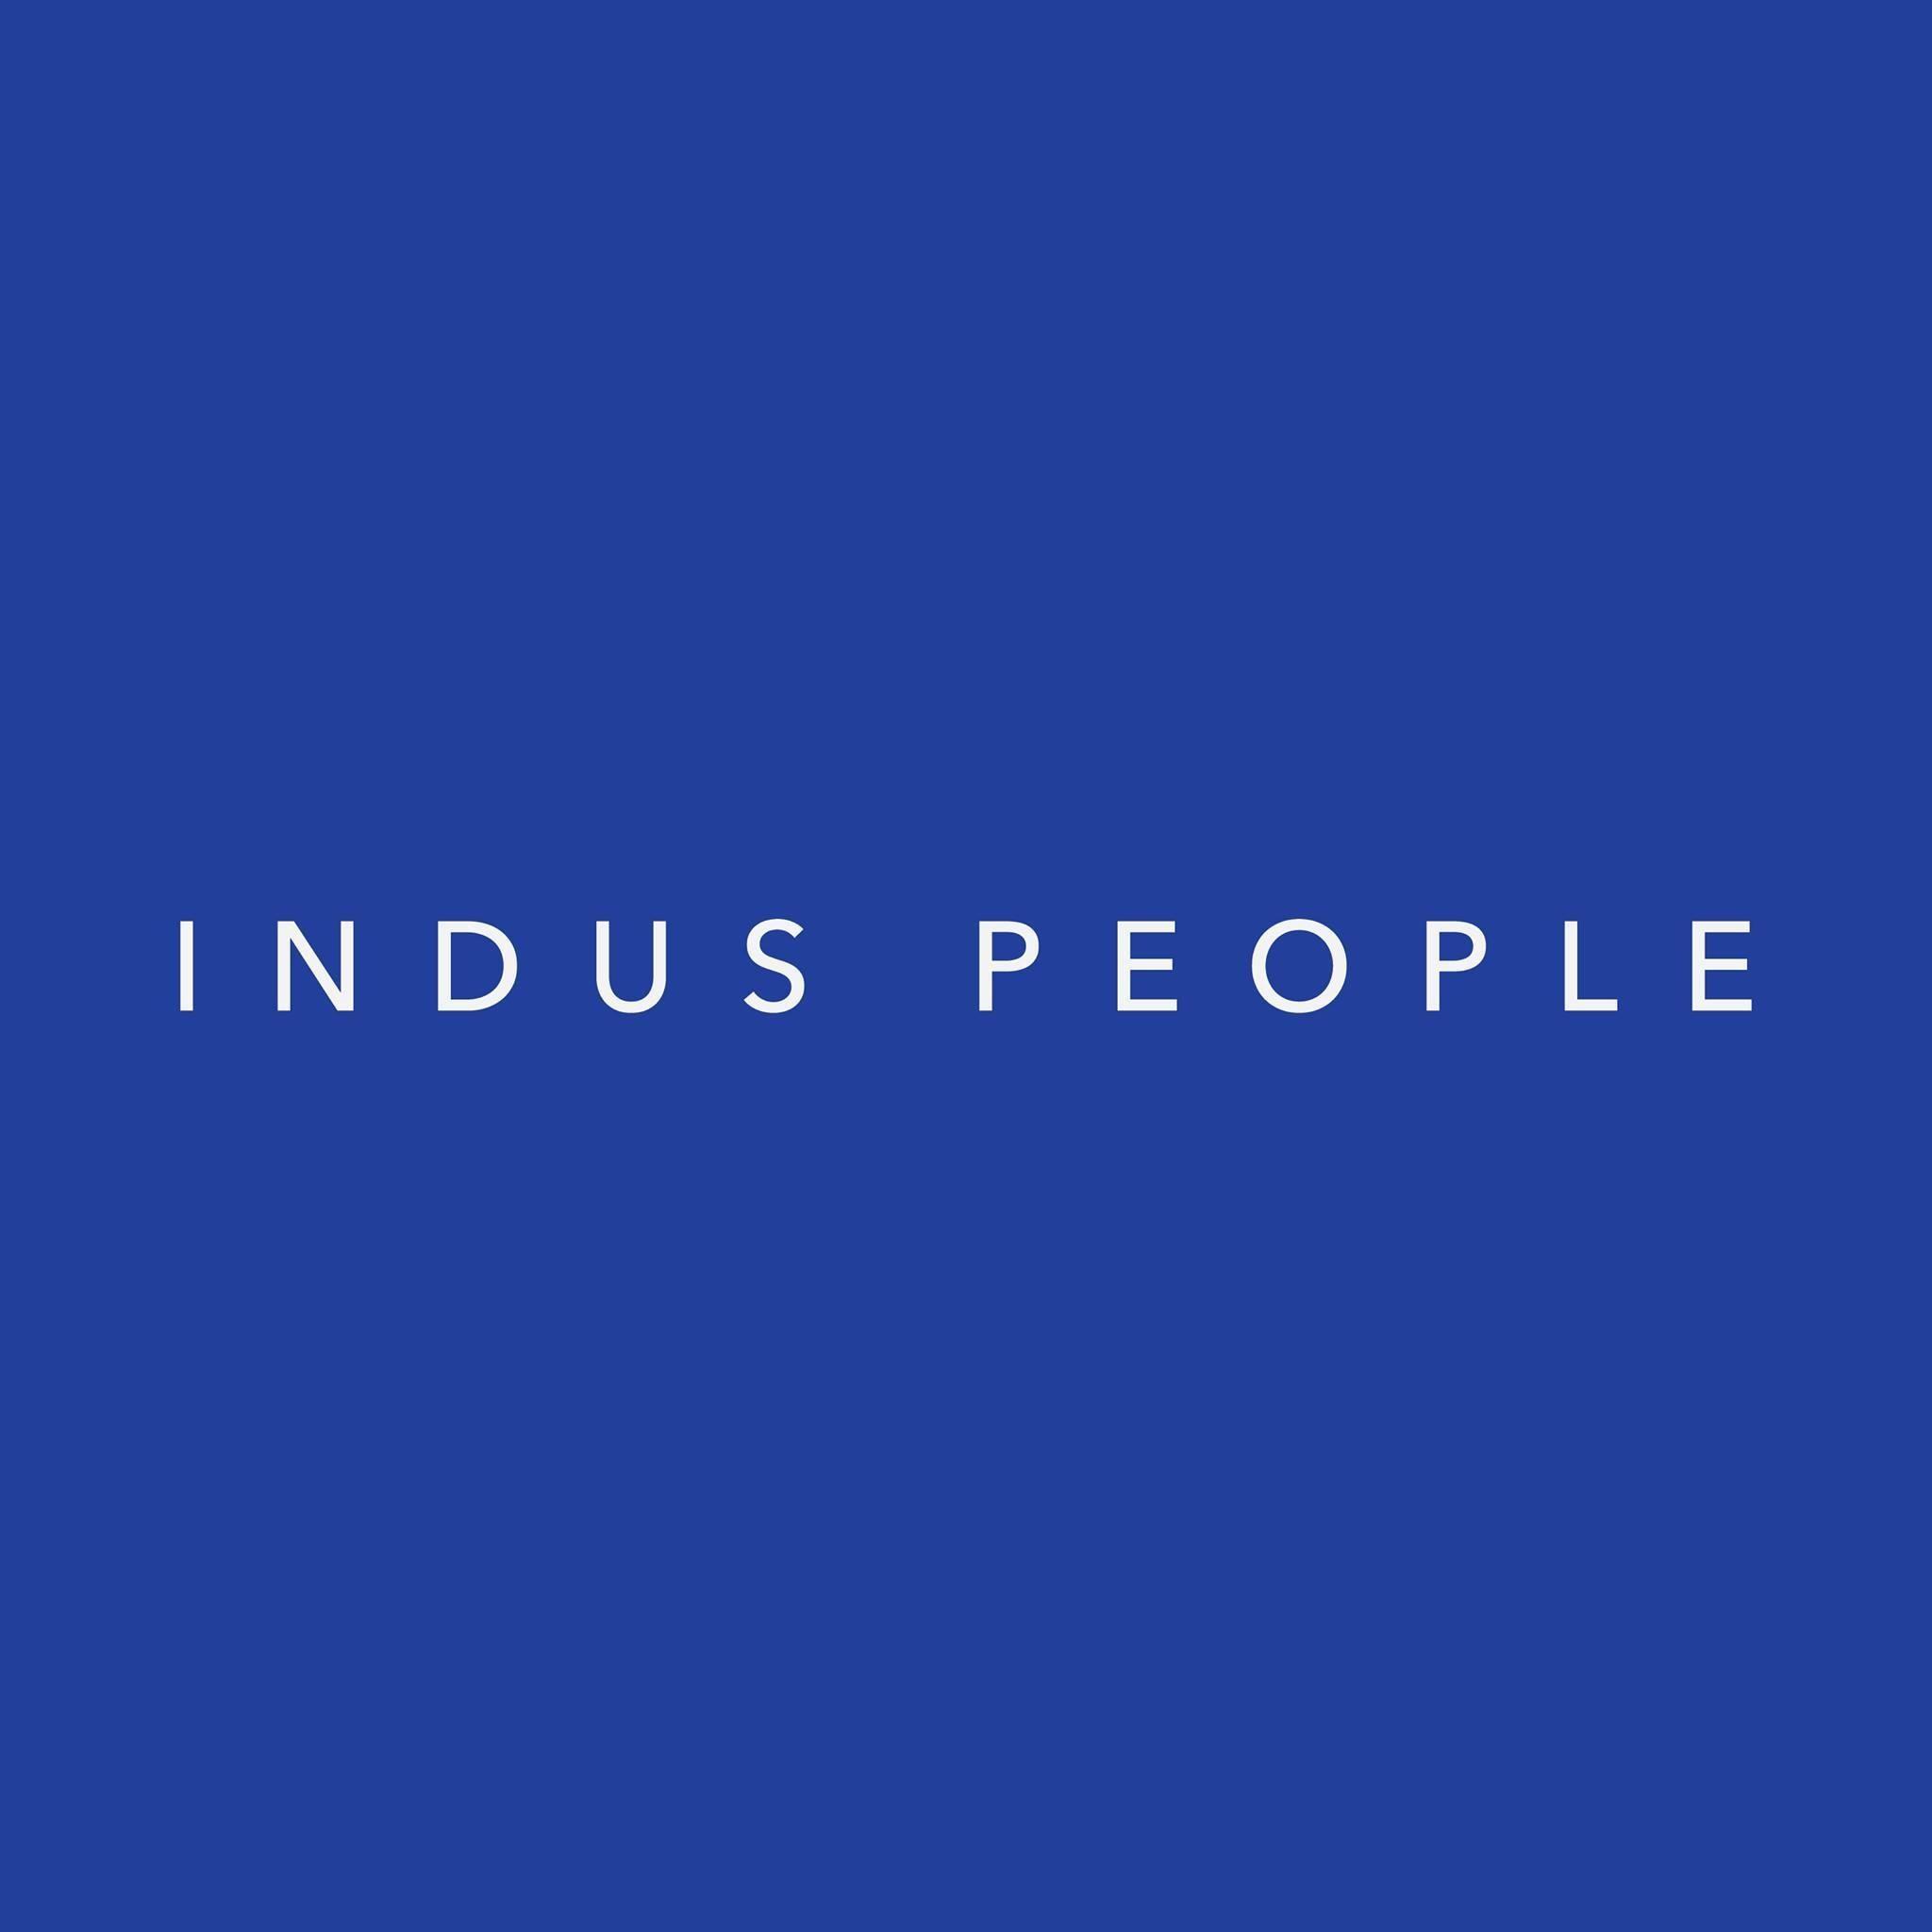 Indus People